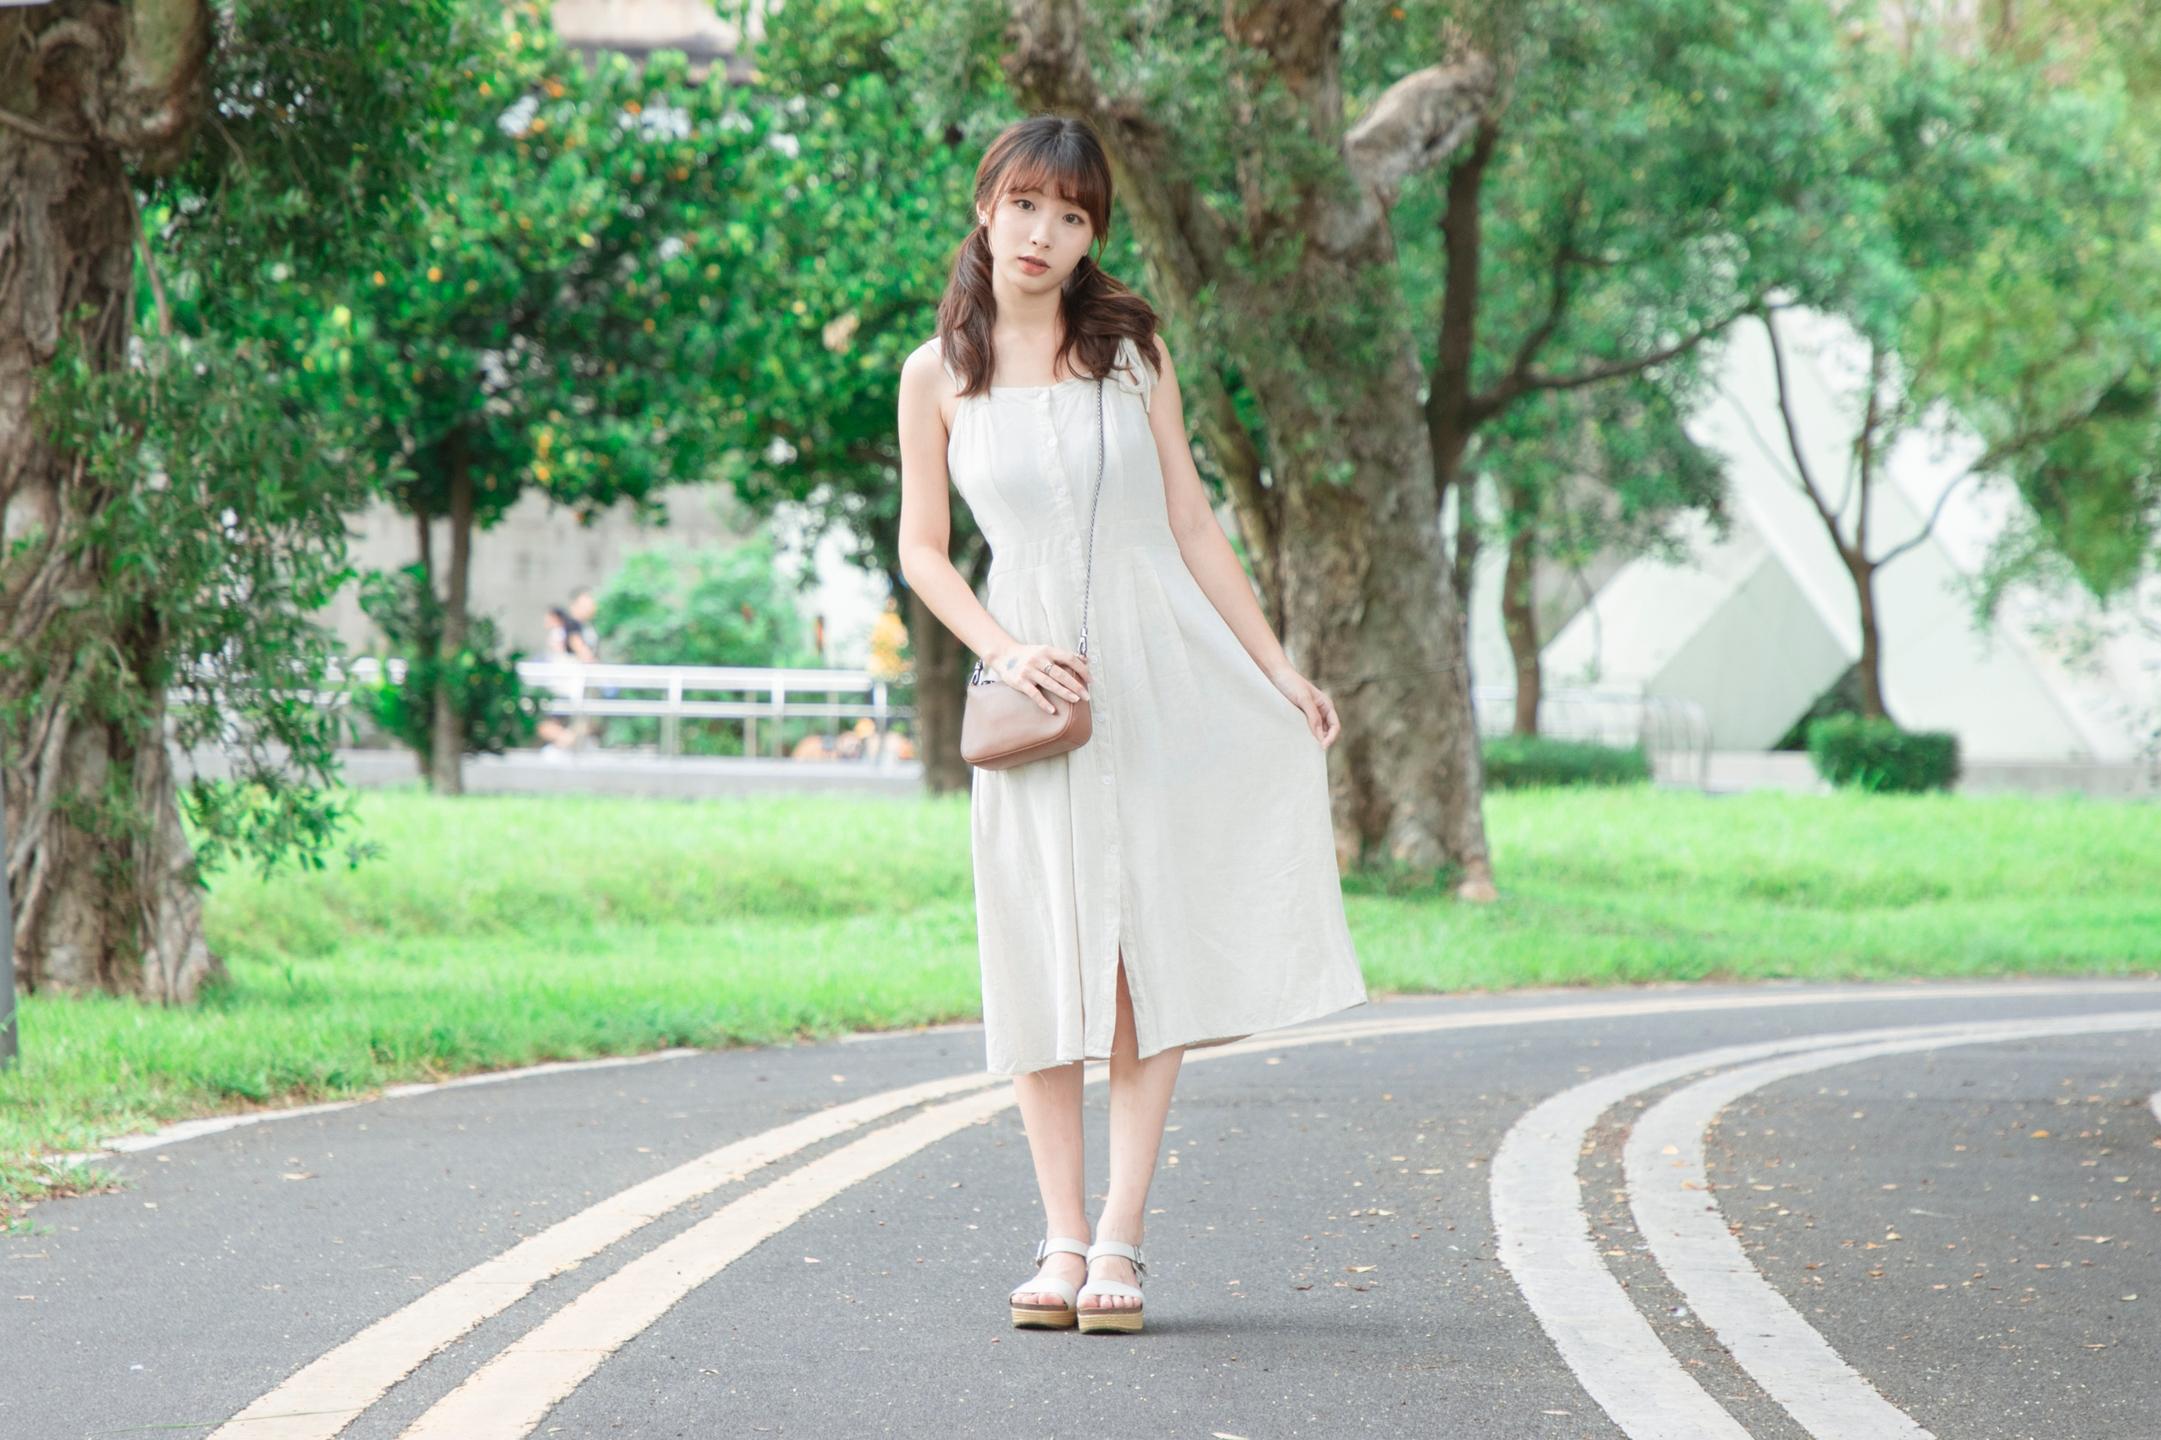 SOHURT | 好藤映像 (@sohurt123) Cover Image